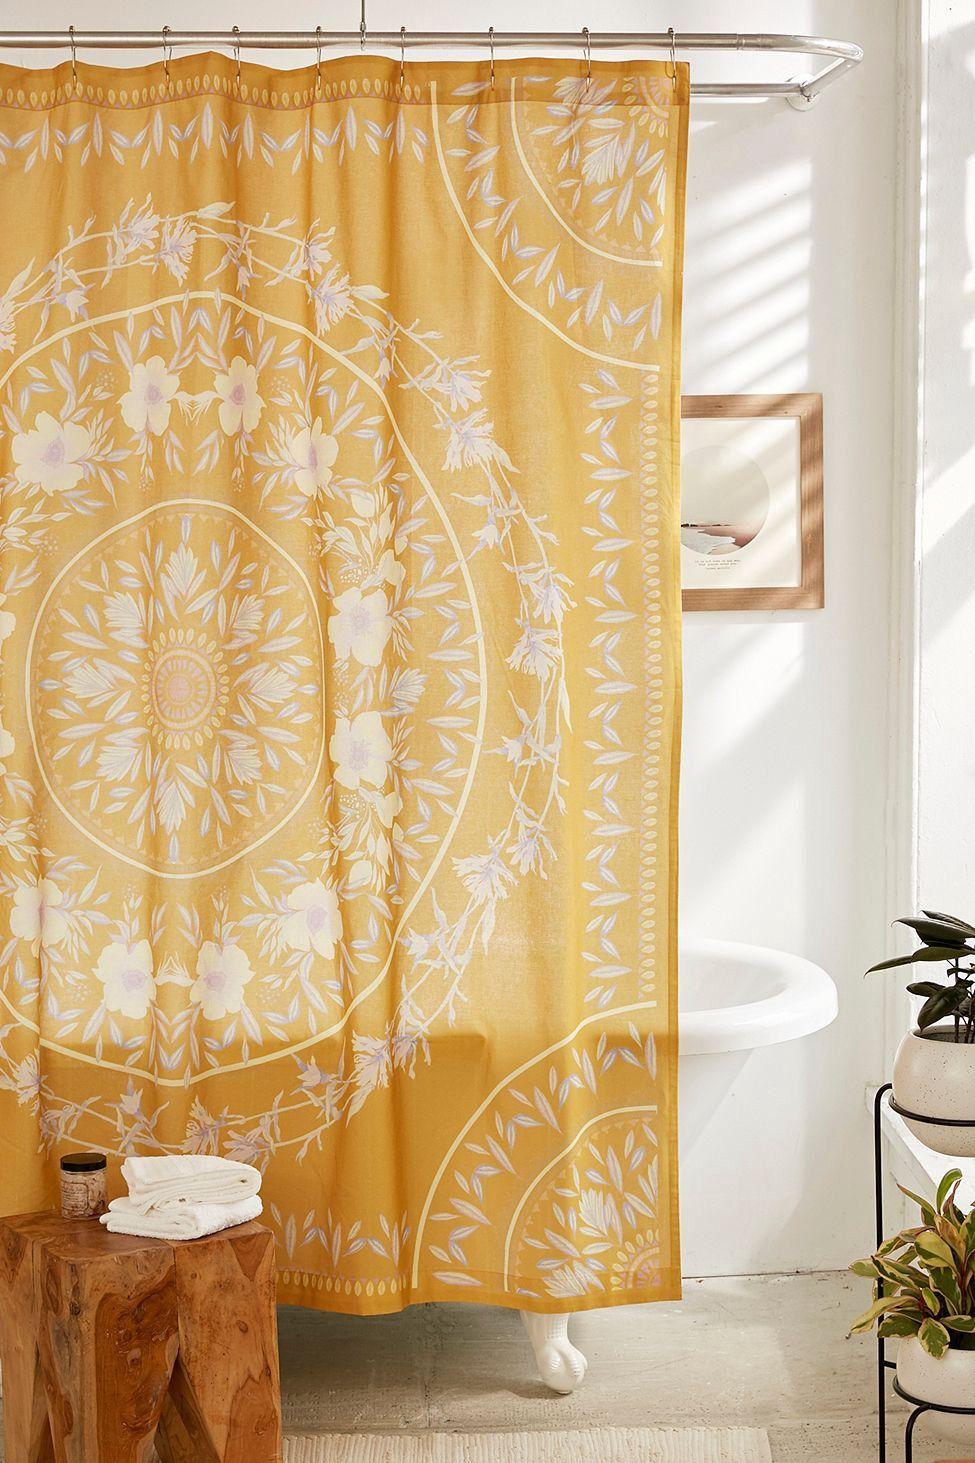 Salle De Bain Avec Muret ~ Urban Outfitters Sketched Floral Medallion Shower Curtain Mustard